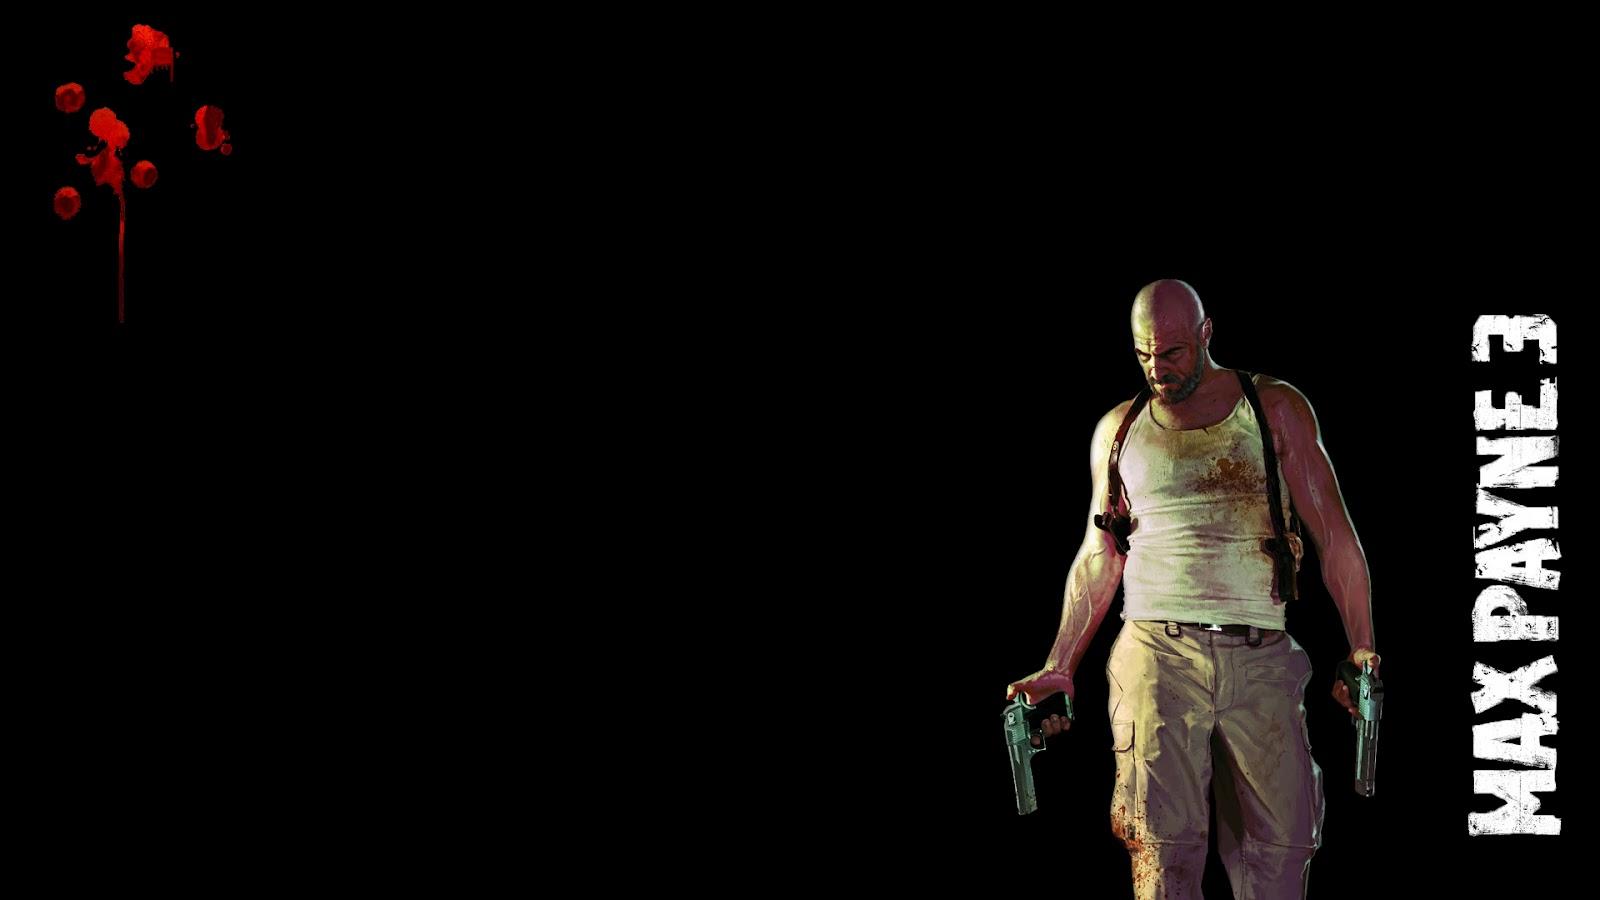 Trololo Blogg Hd Wallpapers Max Payne 3